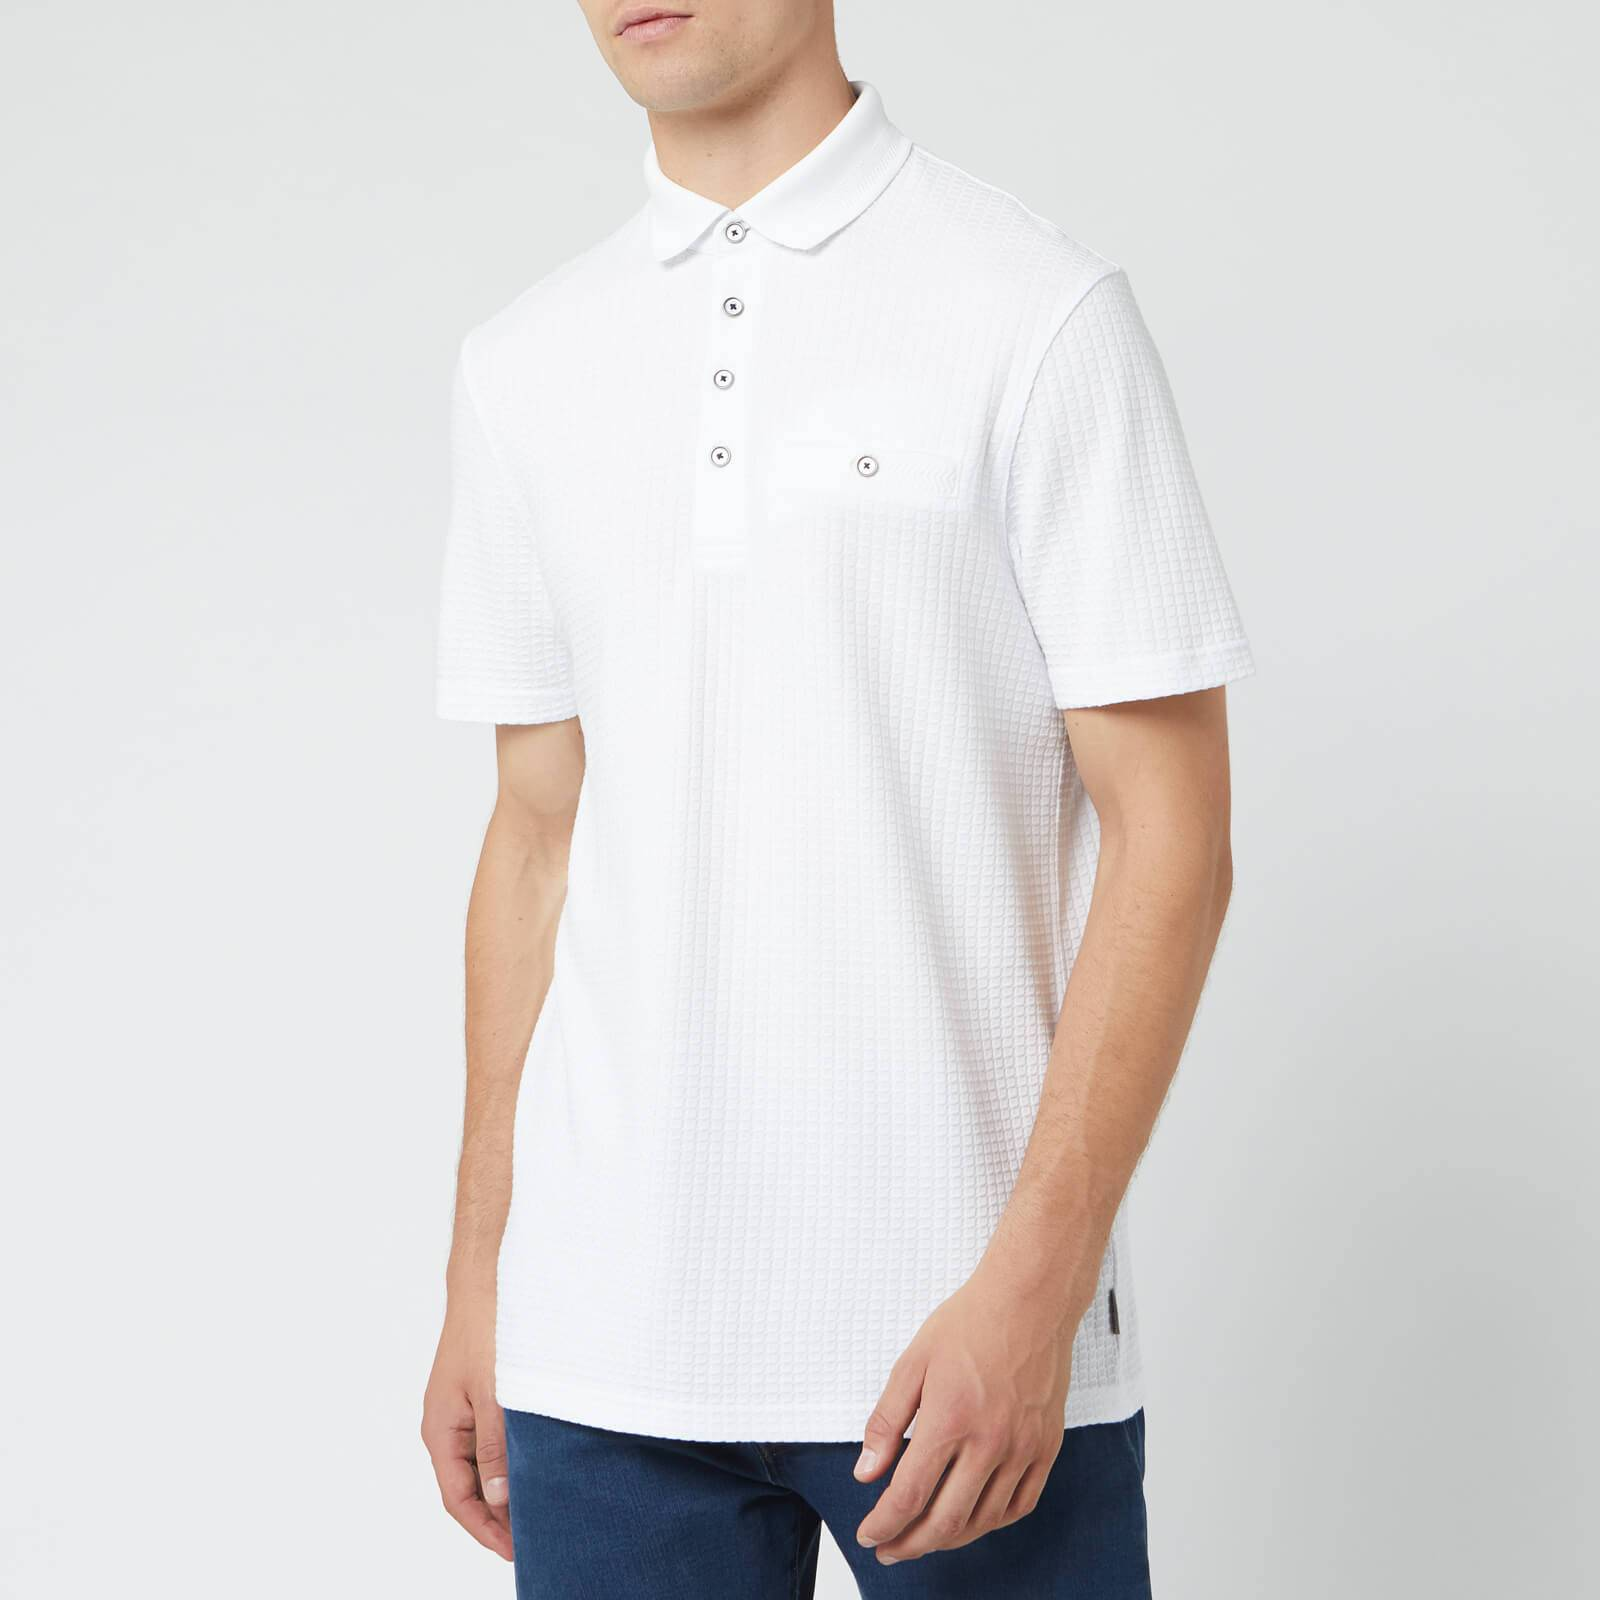 Ted Baker Men's Textured Polo Shirt - White - XL/5